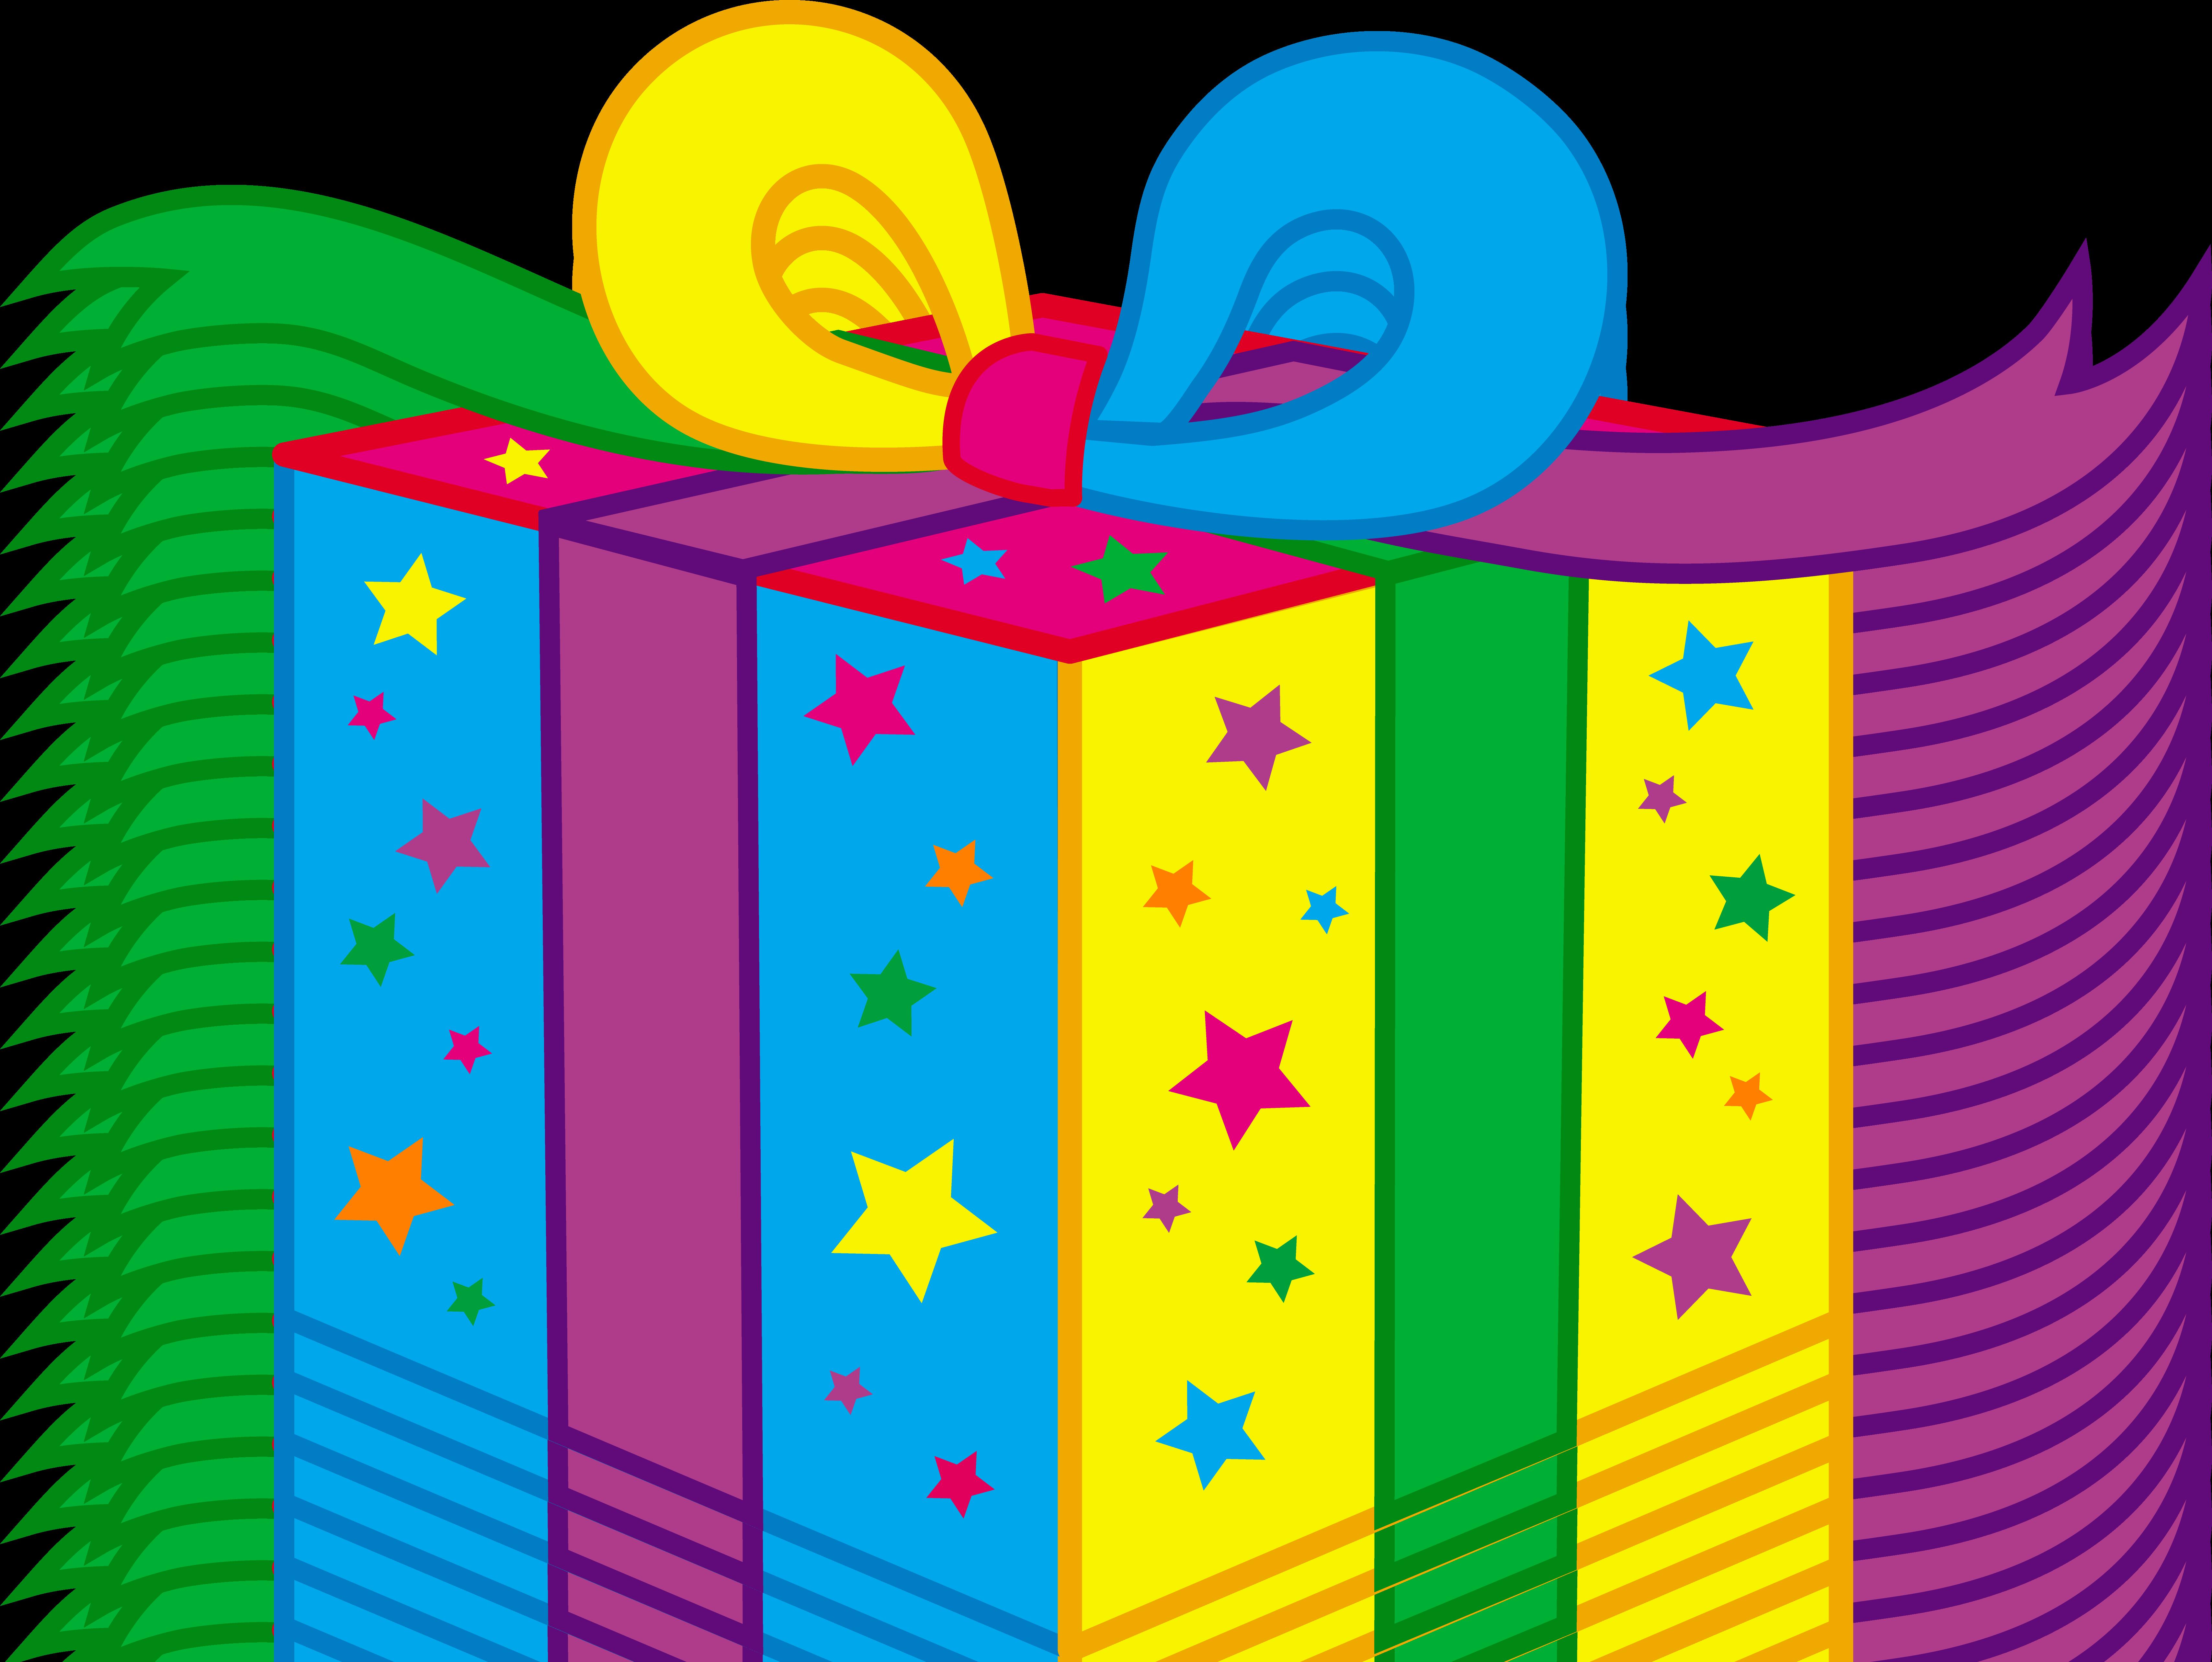 Free animated clipart birthday jpg transparent stock Birthday Gift Clipart jpg transparent stock